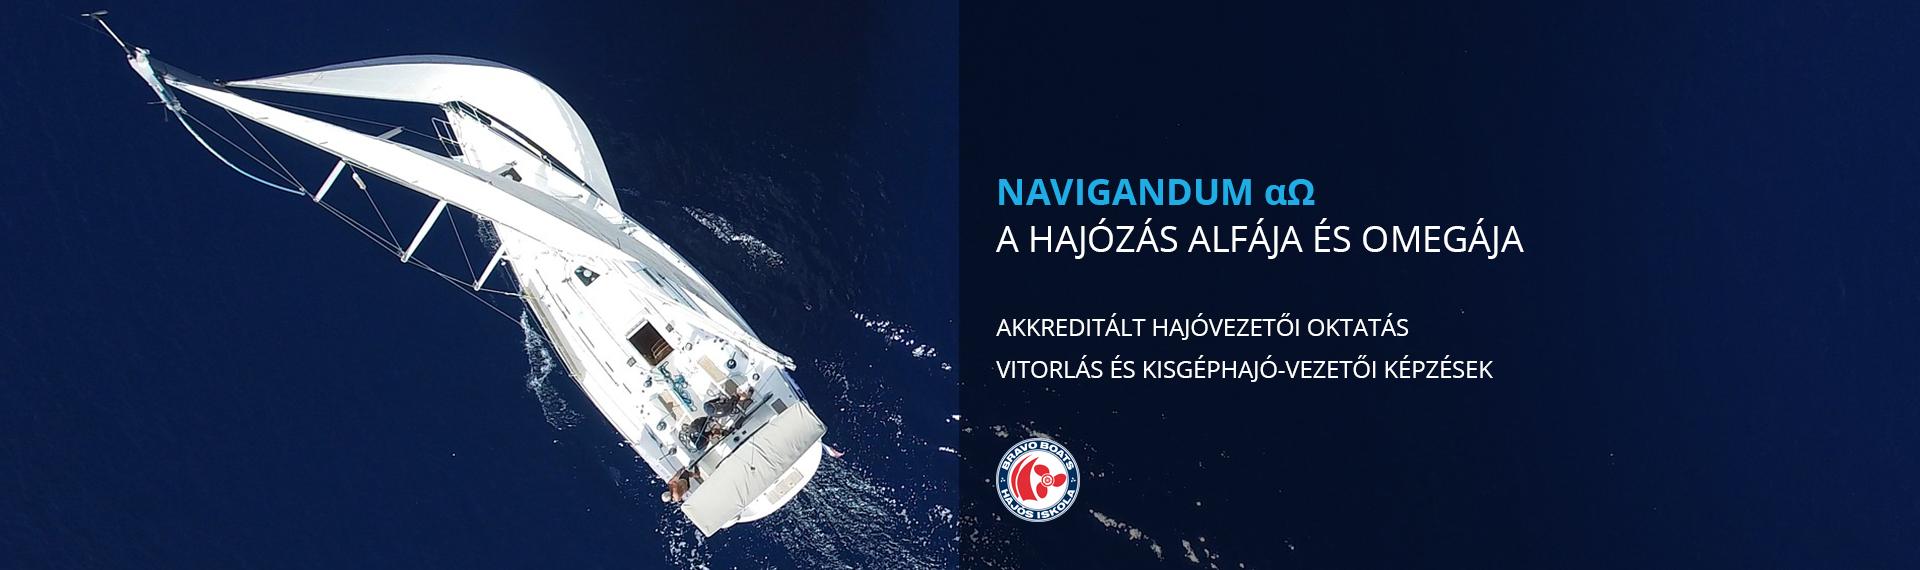 navigandum-header-pc-003.png